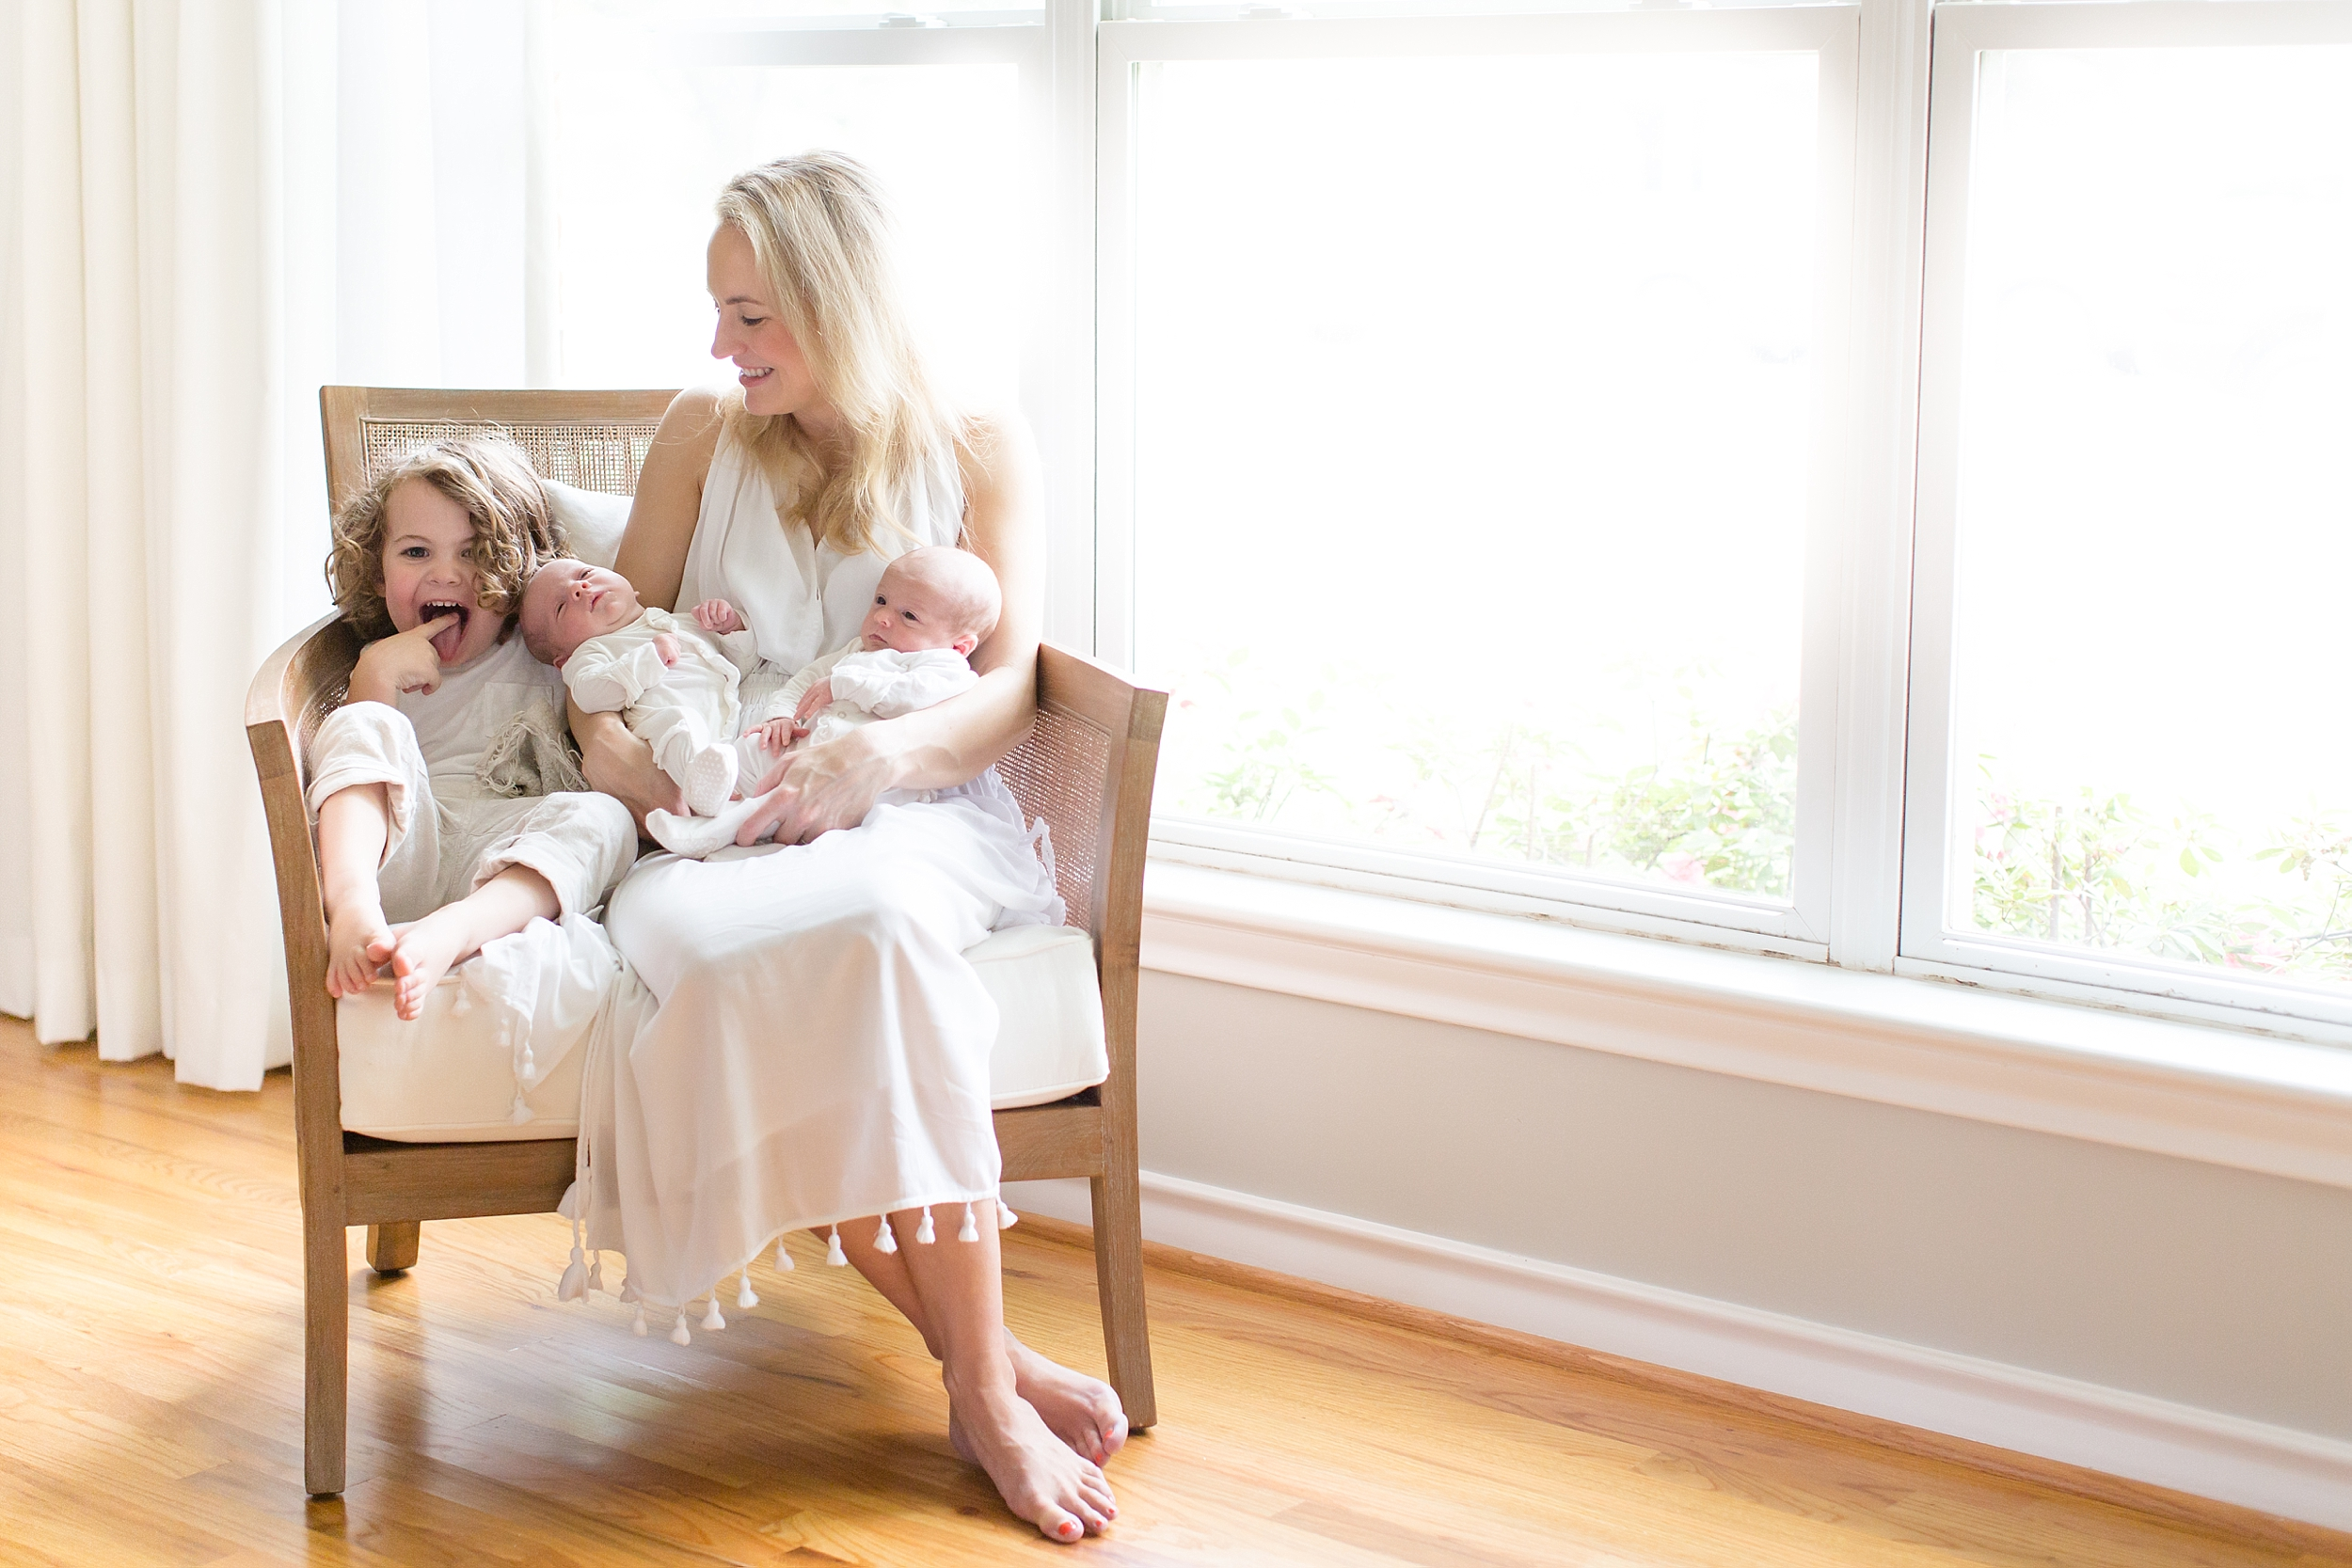 Landon-Schneider-Photography-Holt-Newborn-Session-Texas_0007.jpg